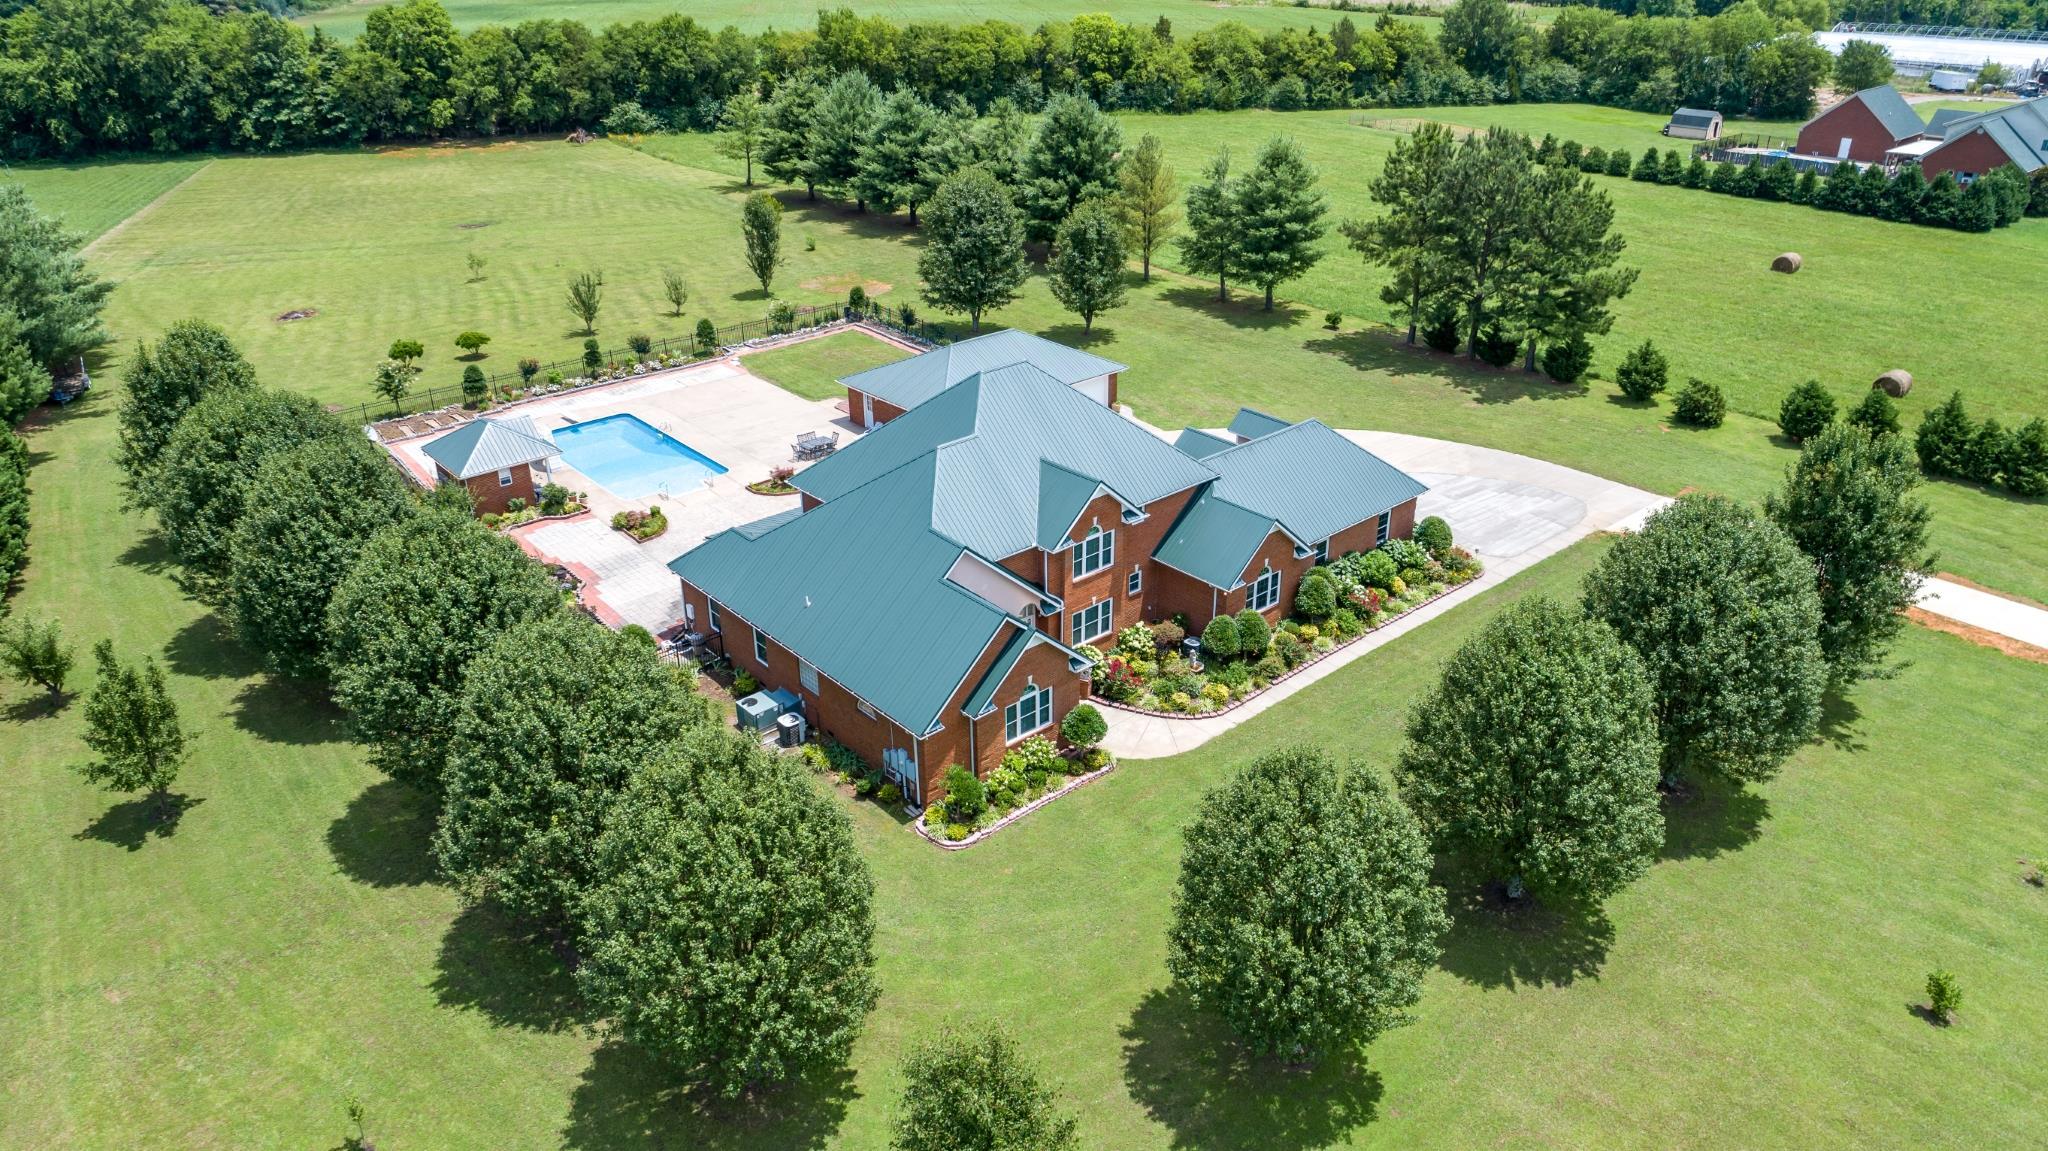 7527 Manchester Pike, Murfreesboro, TN 37127 - Murfreesboro, TN real estate listing